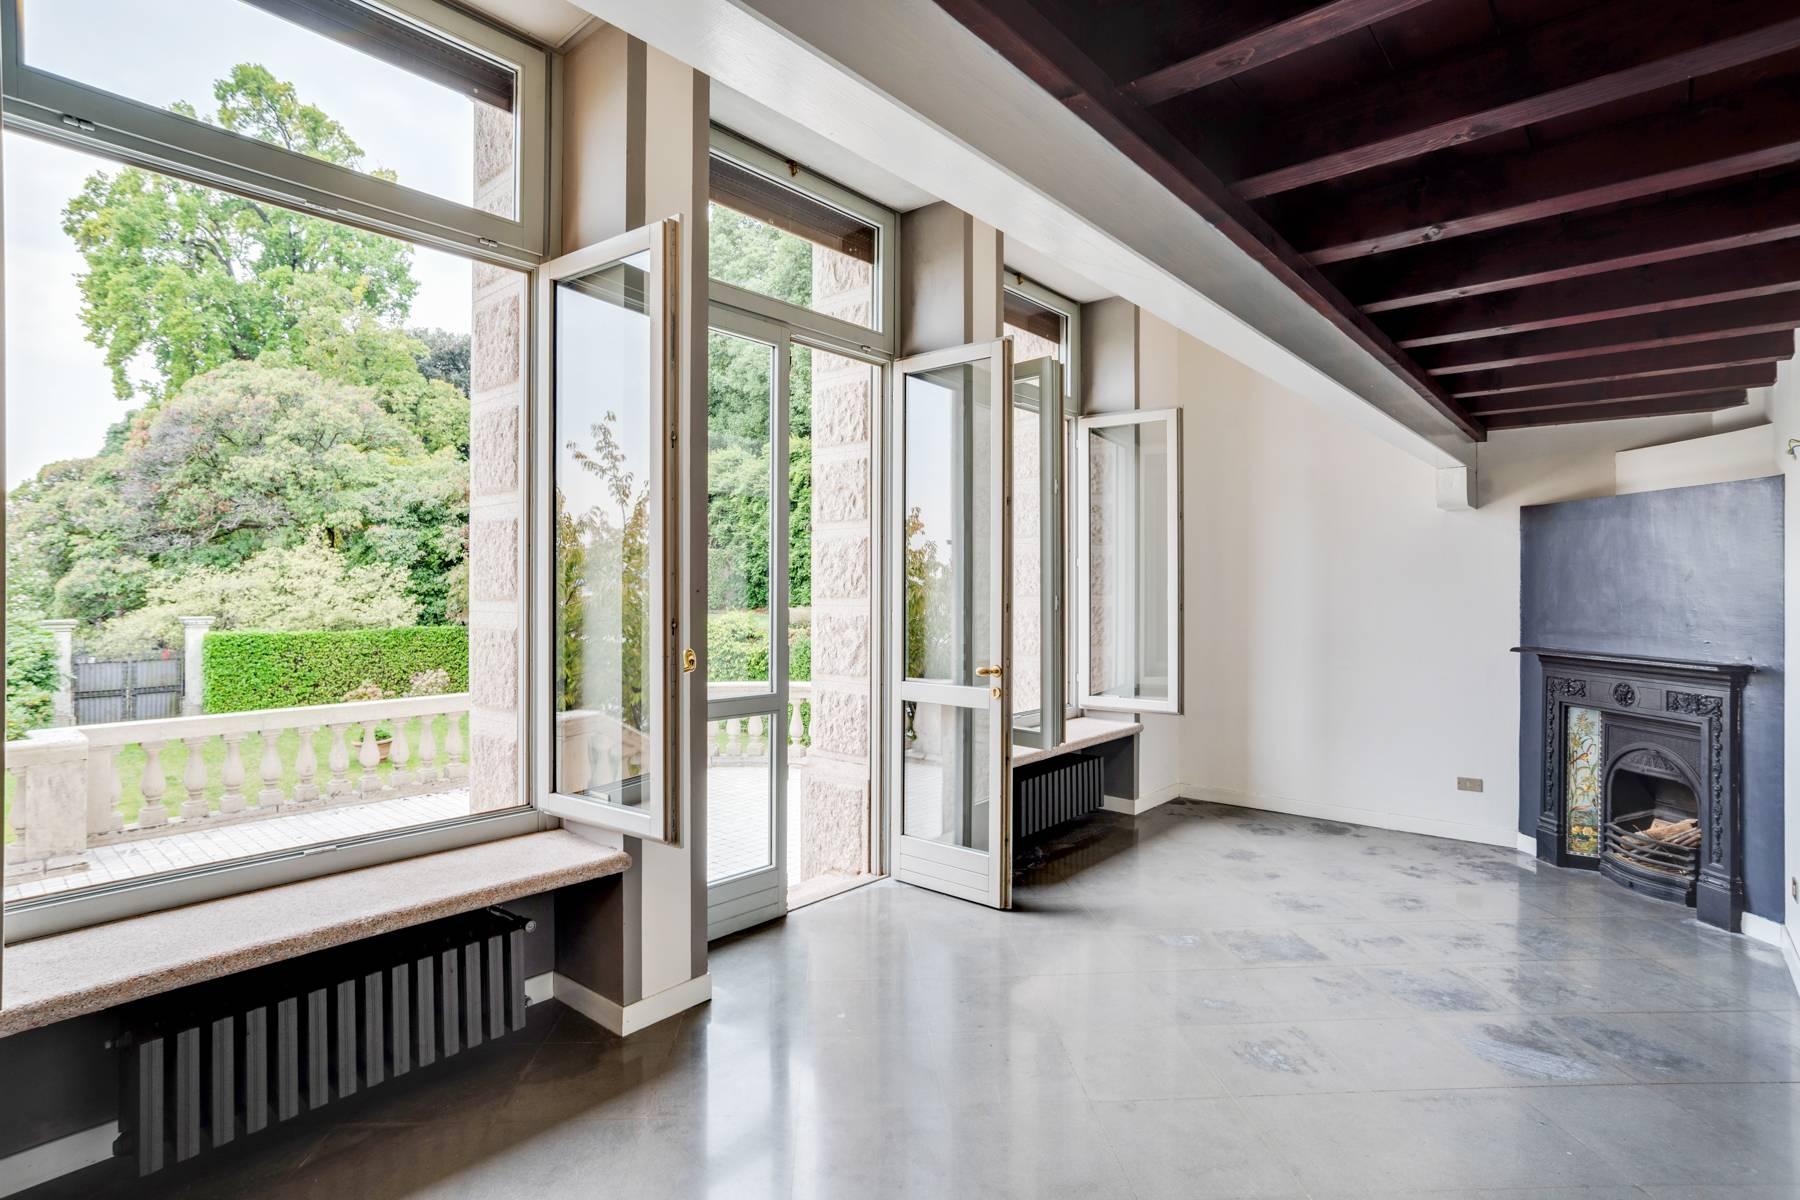 Appartamento in Vendita a Belgirate: 4 locali, 118 mq - Foto 10